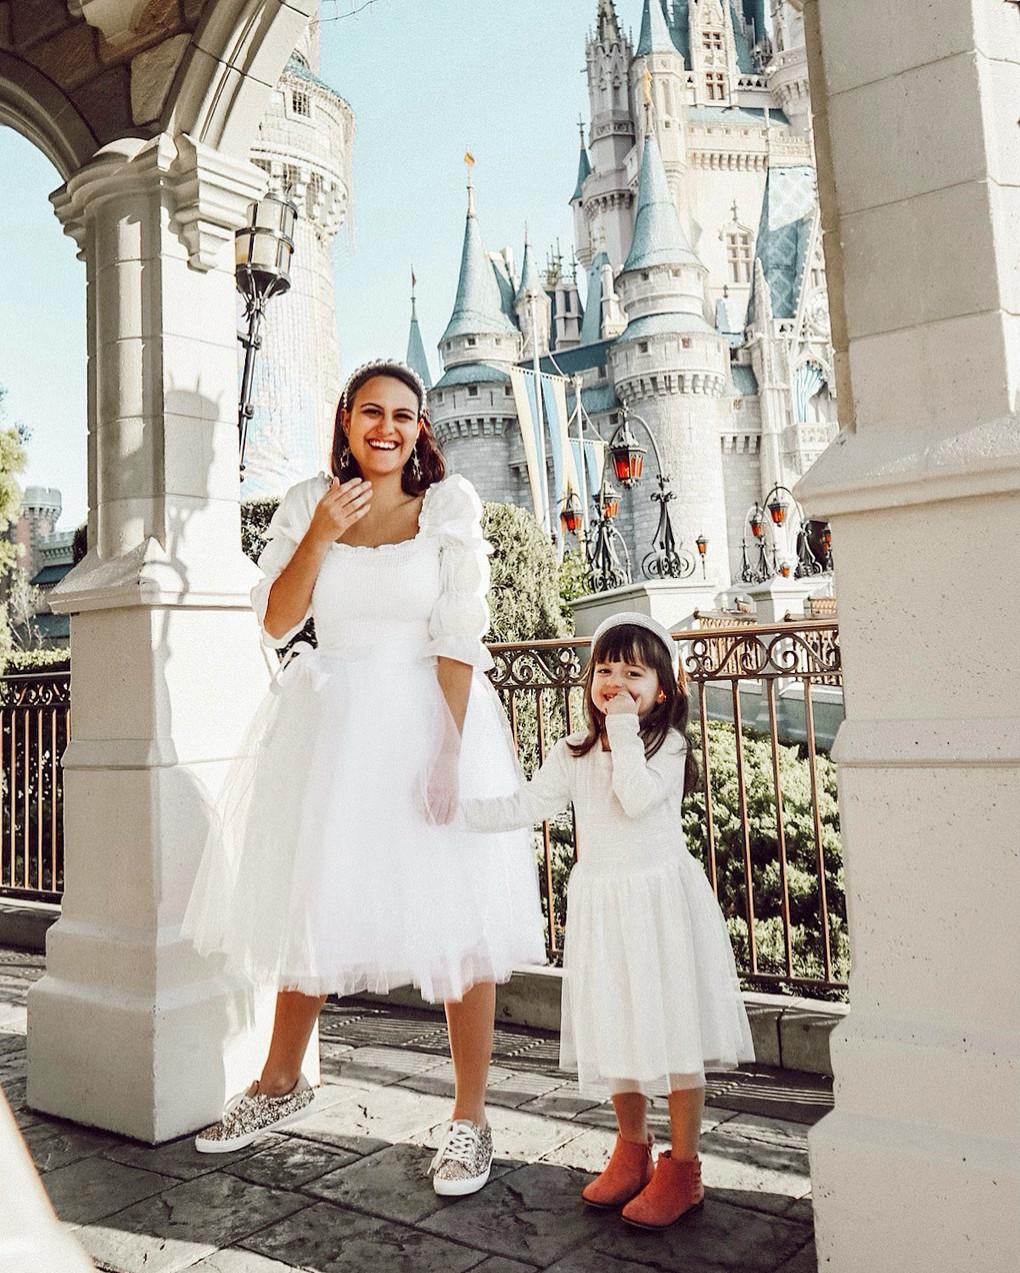 Disney World at Orlando World Center Marriott for Tom's 30th